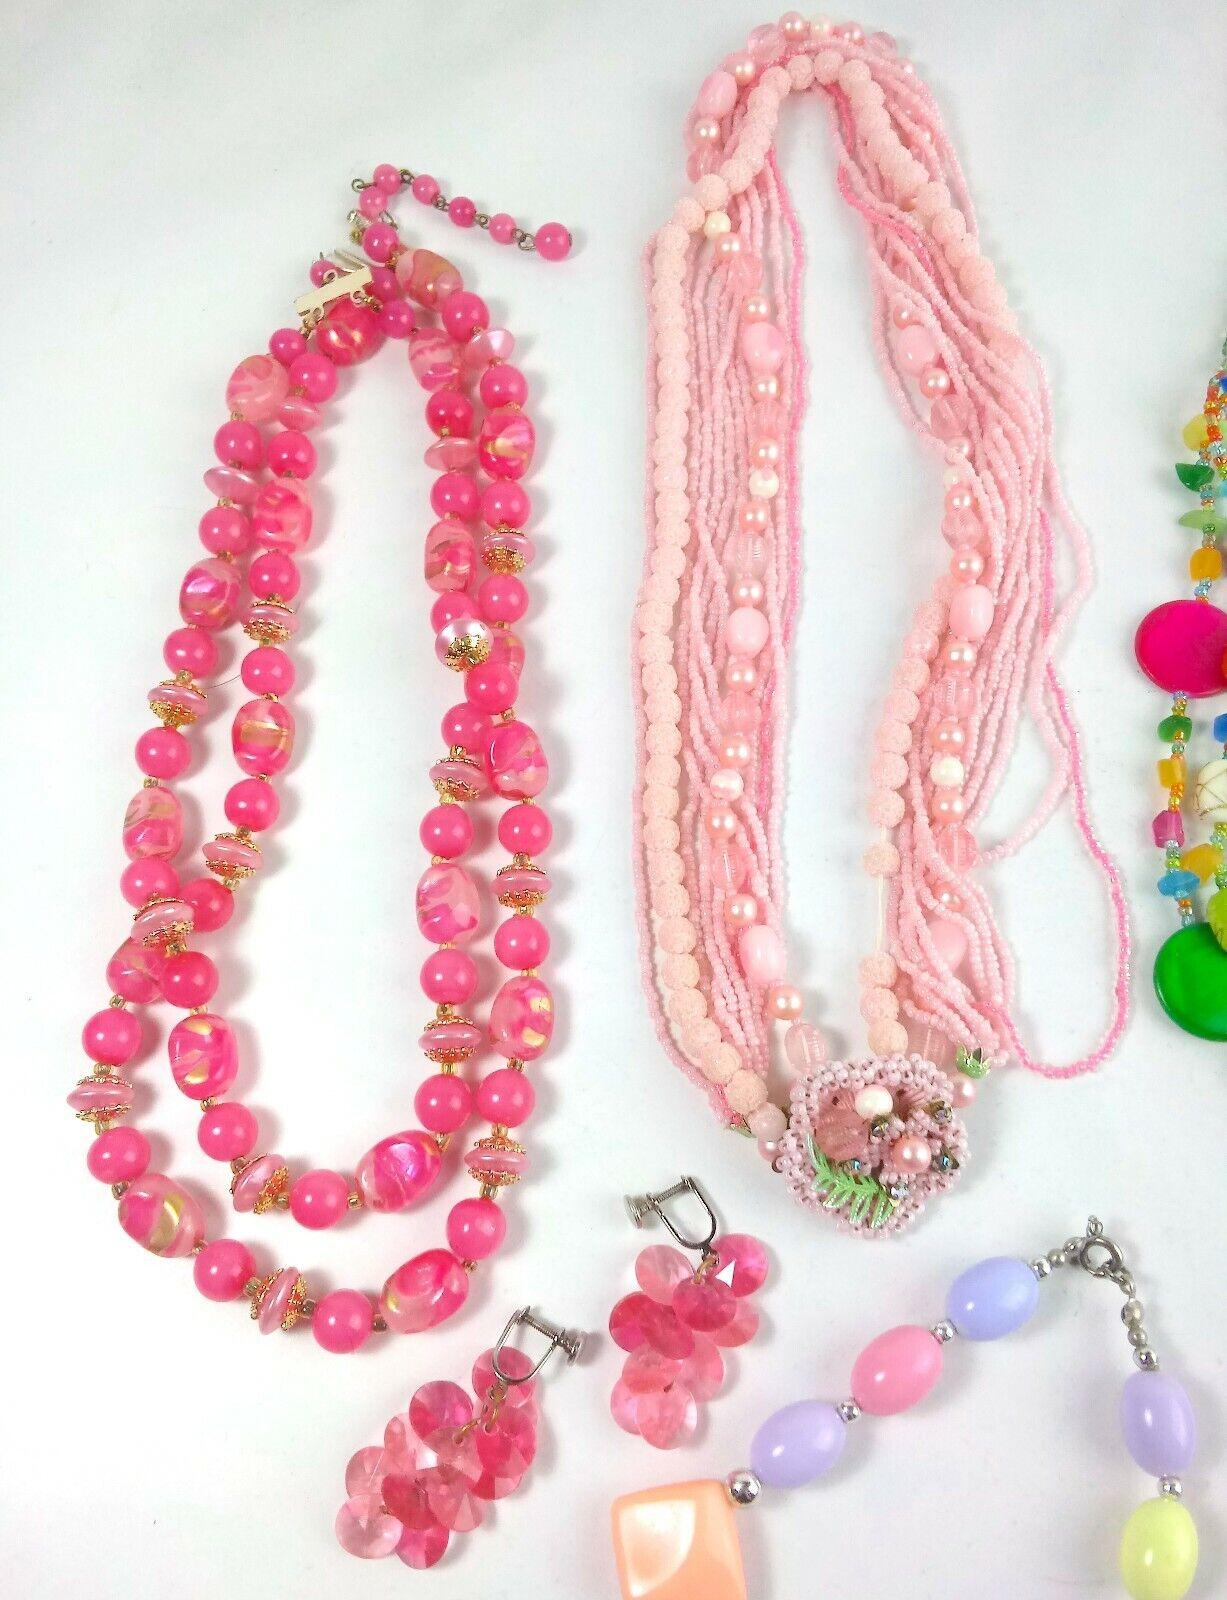 Costume Jewelry Lot Necklaces Bracelet Earrings - image 2